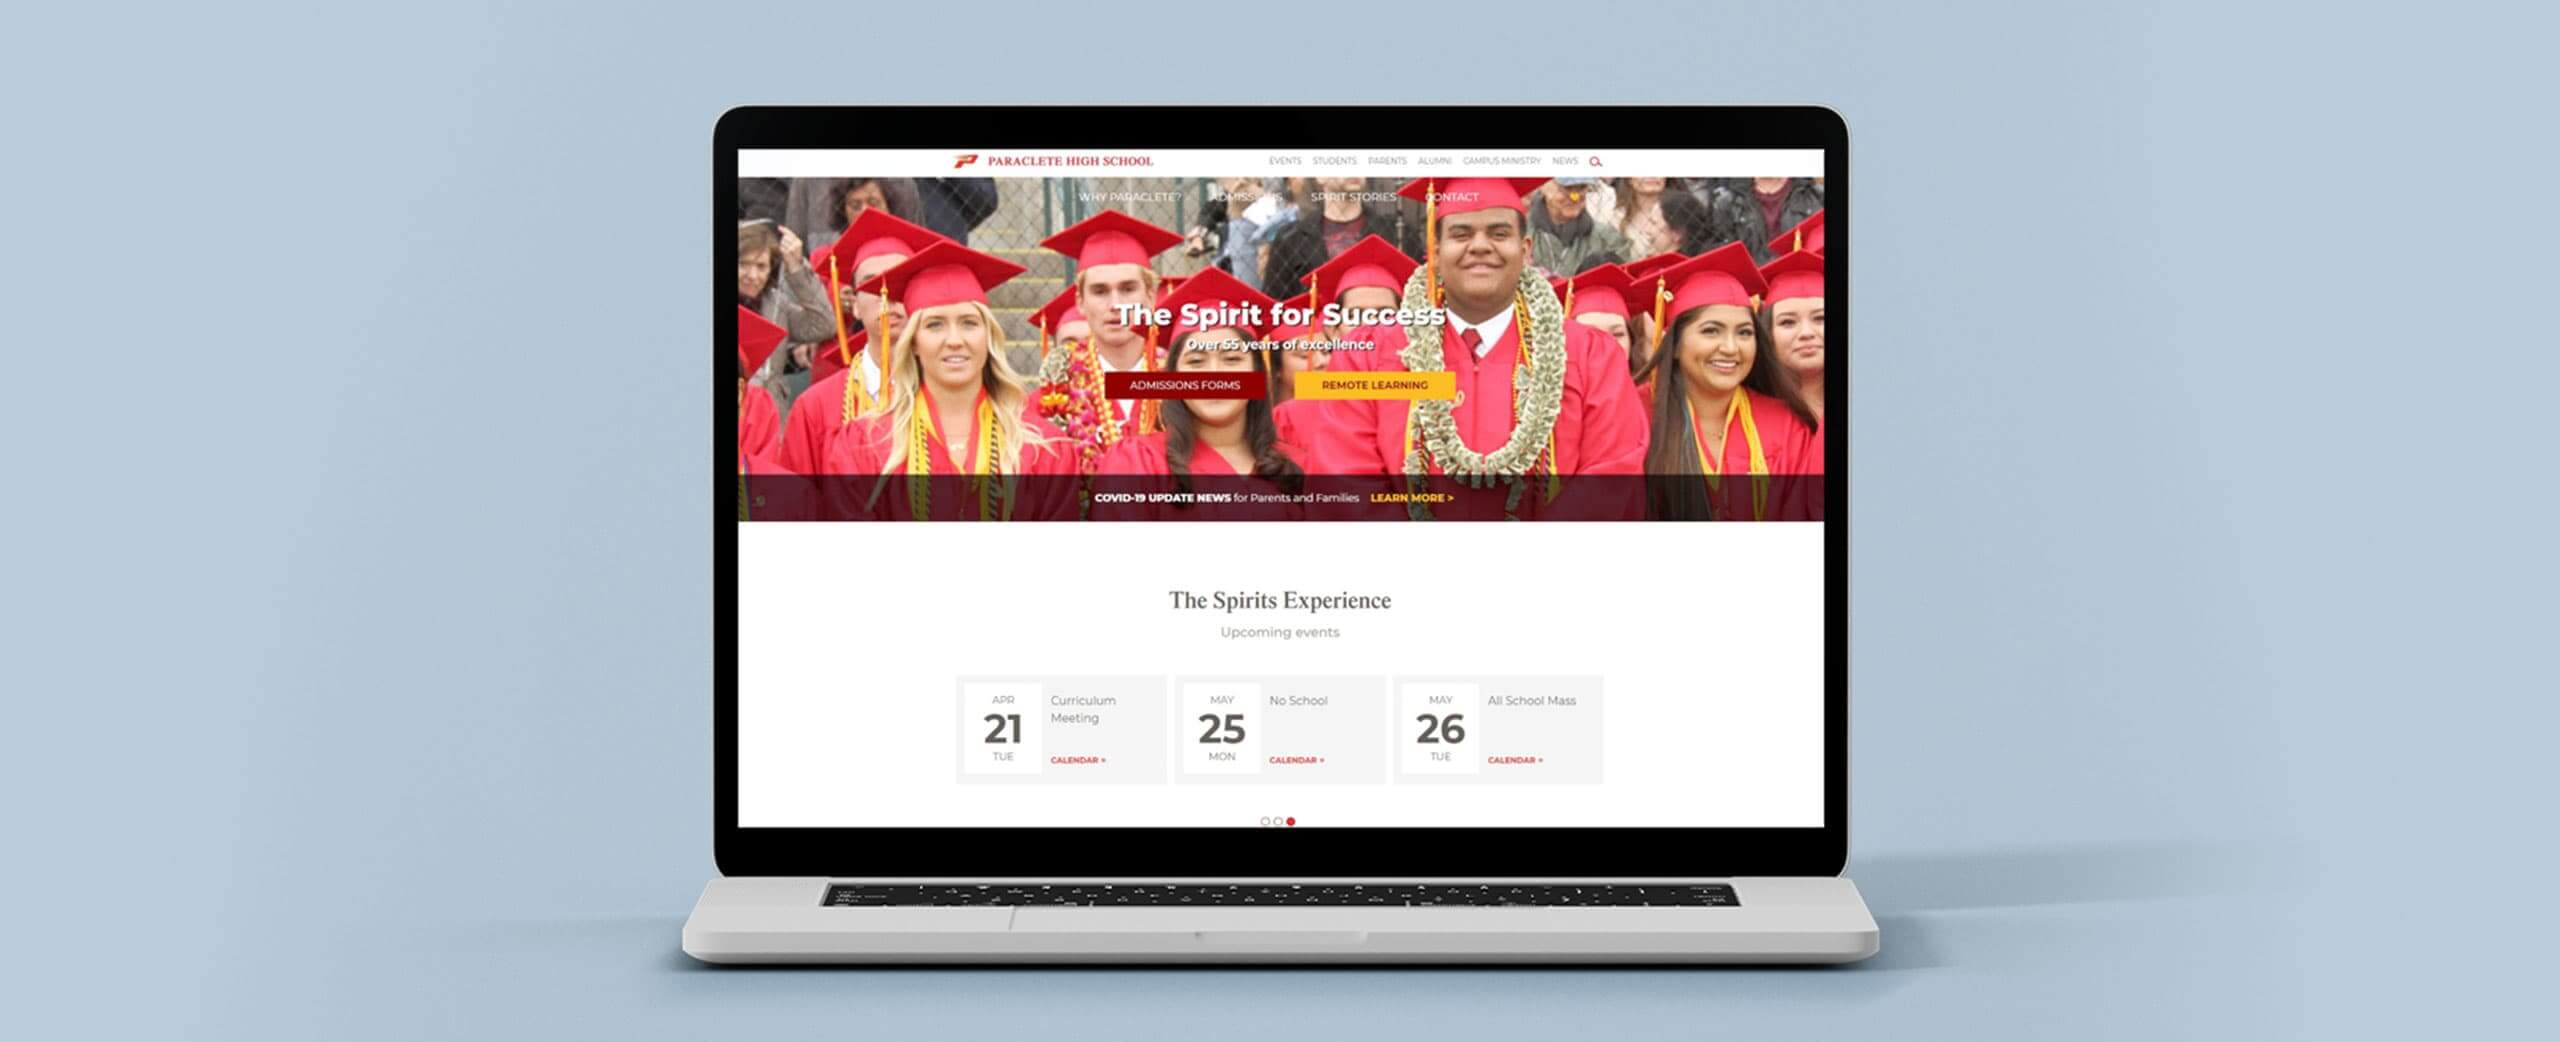 phs-homepage